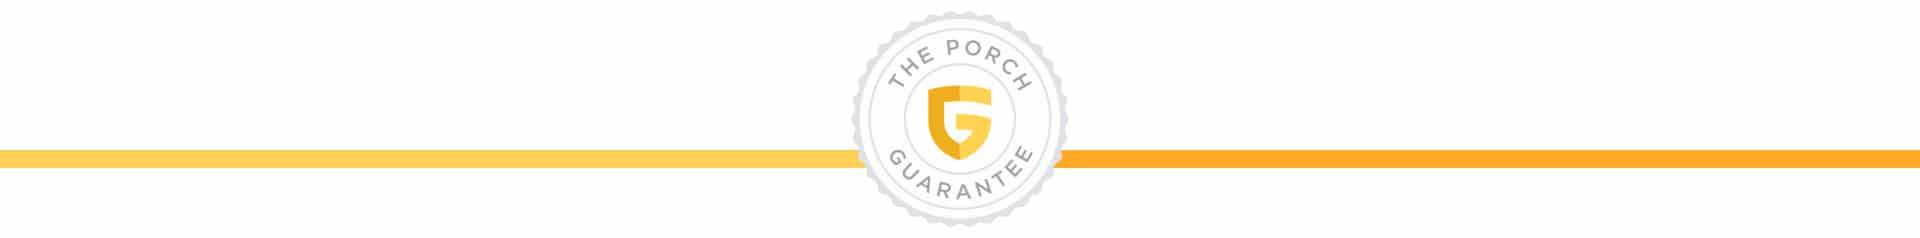 Porch Guarantee Seal